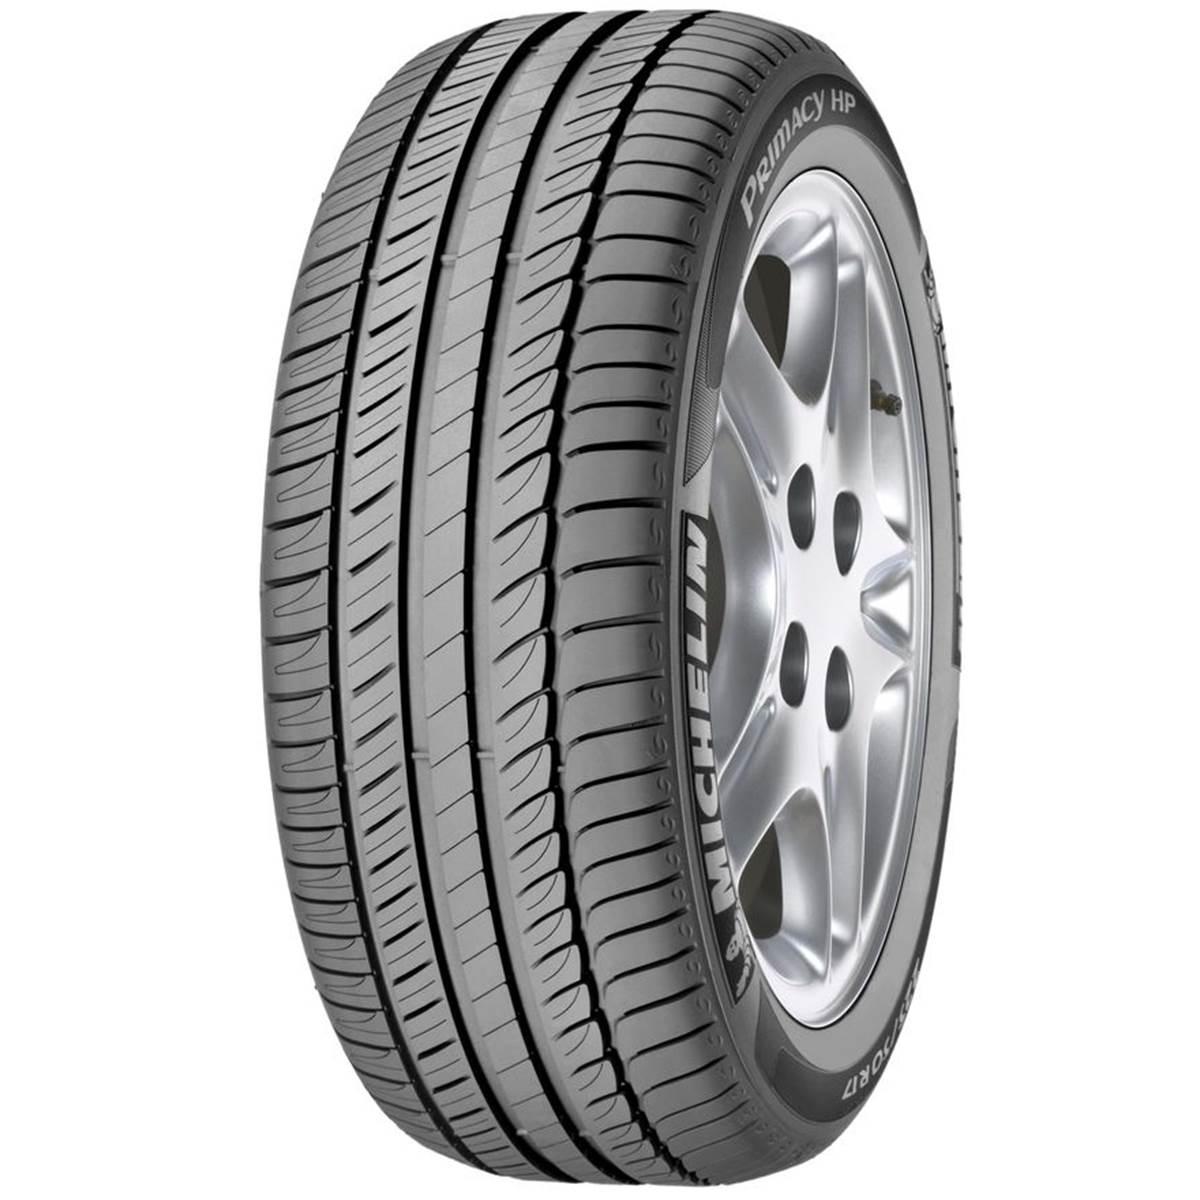 Pneu Michelin 245/40R18 93Y Primacy Hp